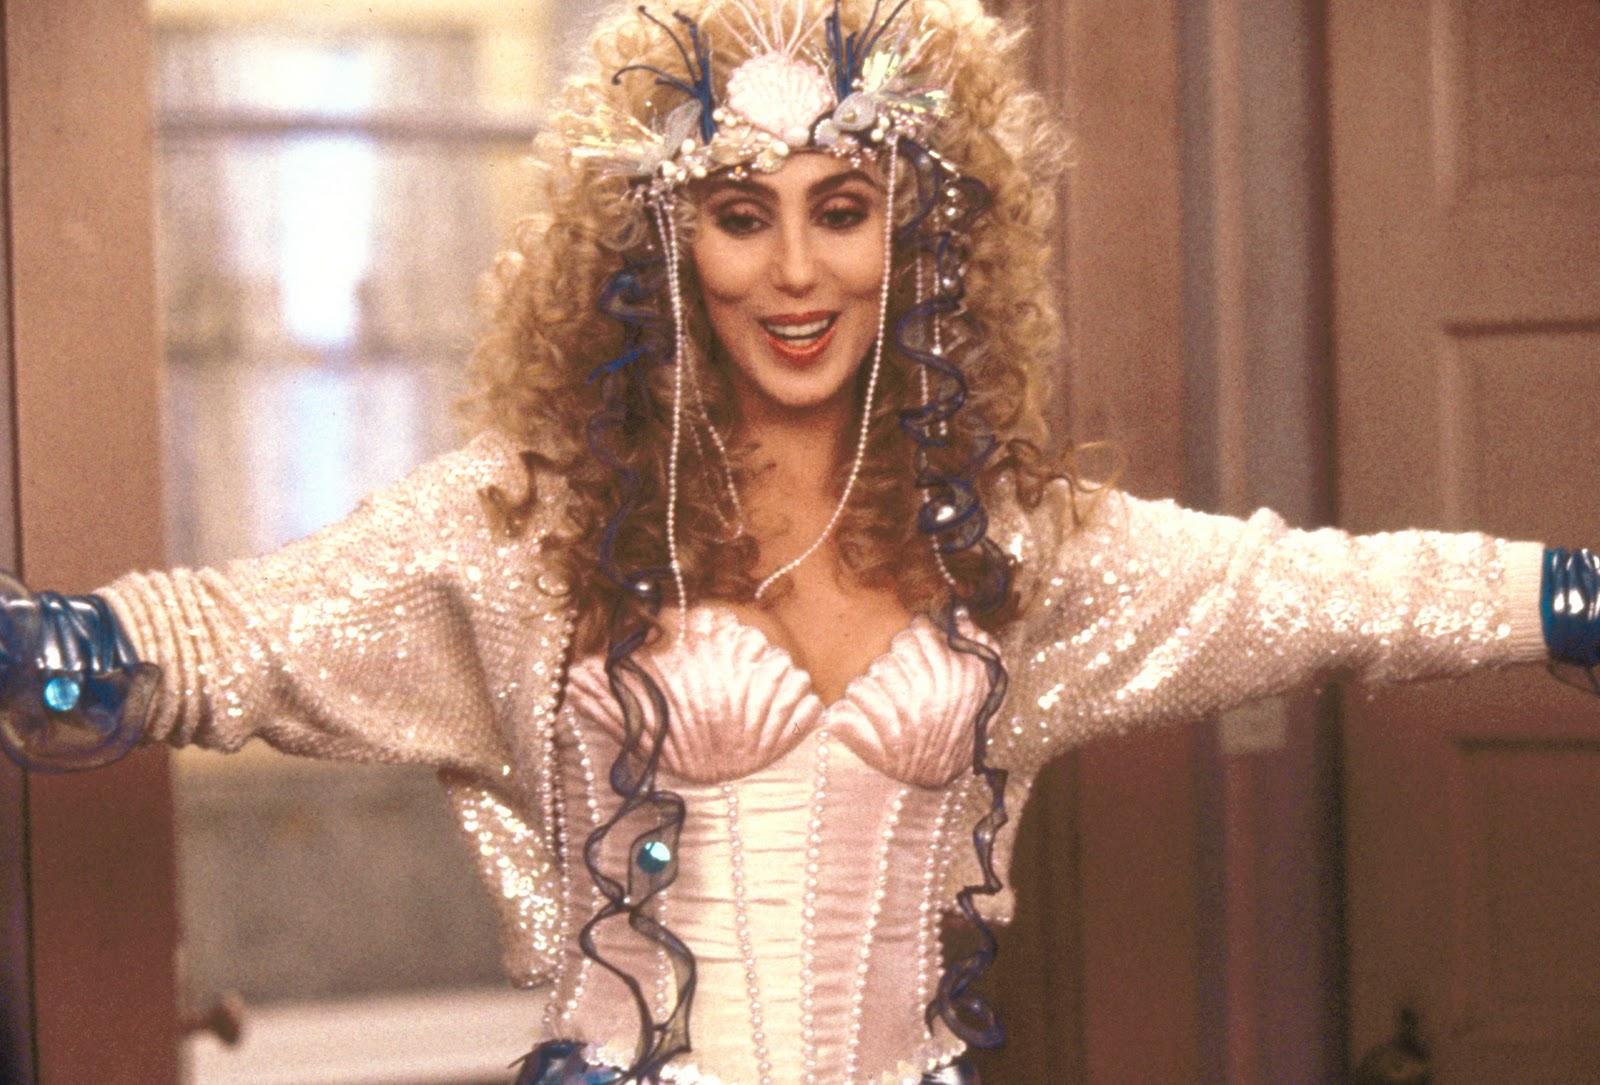 http://1.bp.blogspot.com/_q-ulWAwpK9Y/TPv2KlZ6xfI/AAAAAAAAWDE/gxnHgVBIXTY/s1600/Mermaids.jpg